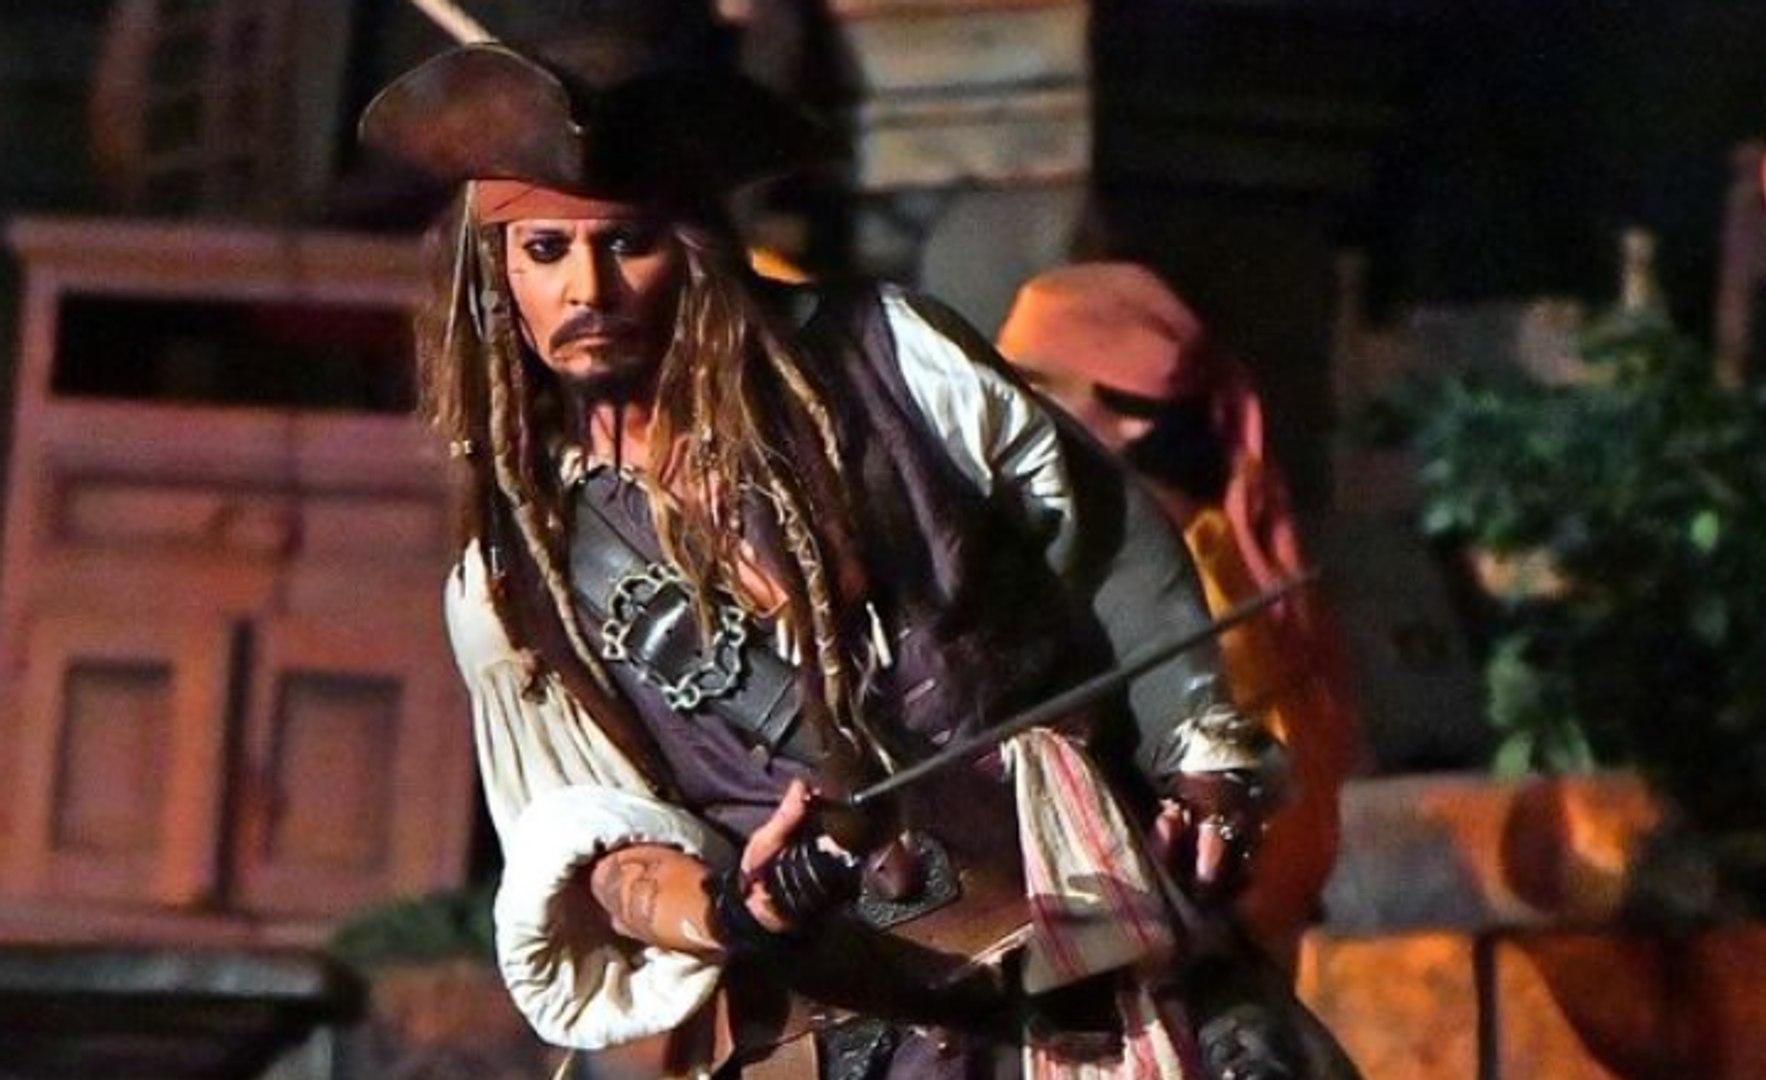 JOHNNY DEPP surprend ses fans à Disneyland en JACK SPARROW